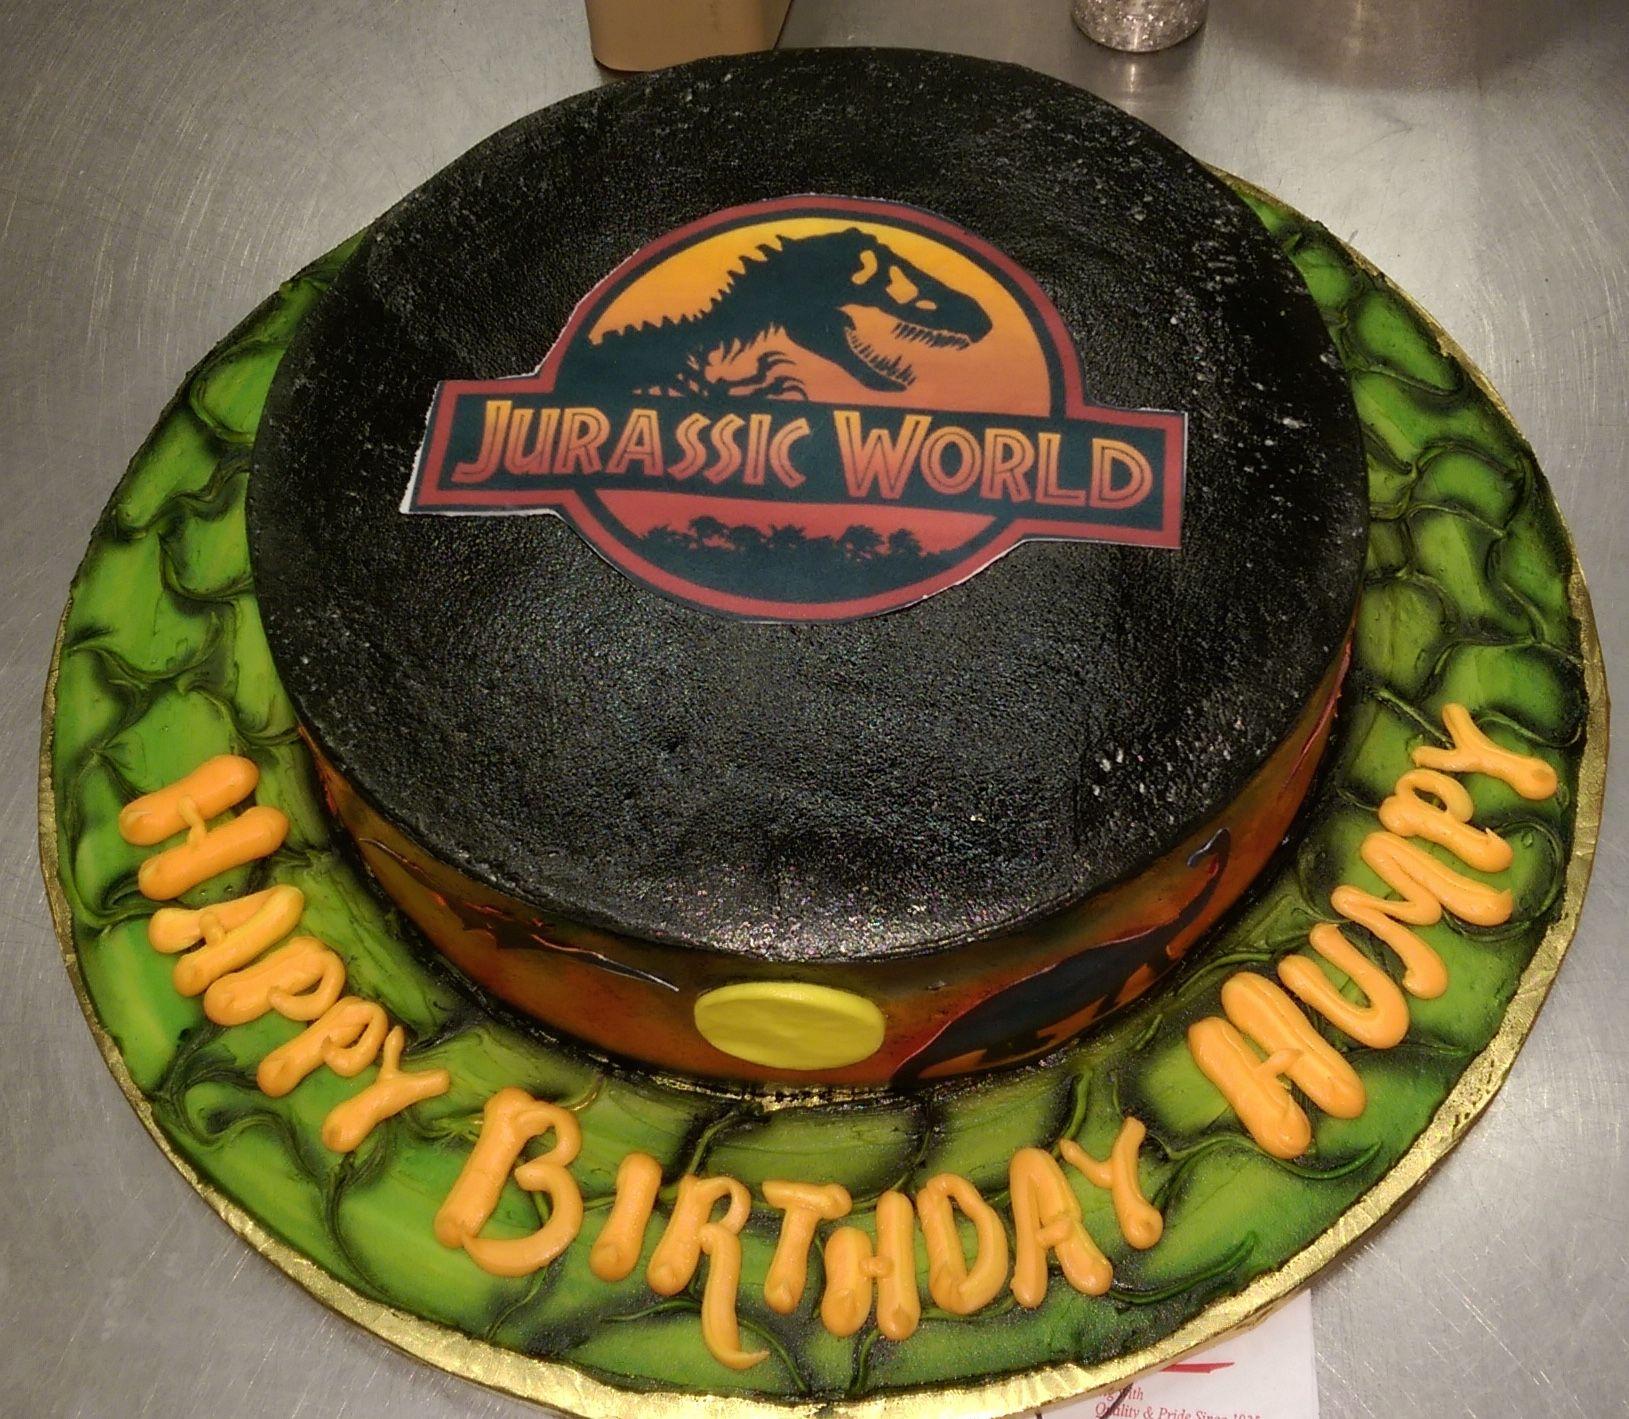 Calumet Bakery Jurassic World Cake Jurassic World Cake Piece Of Cakes Cake